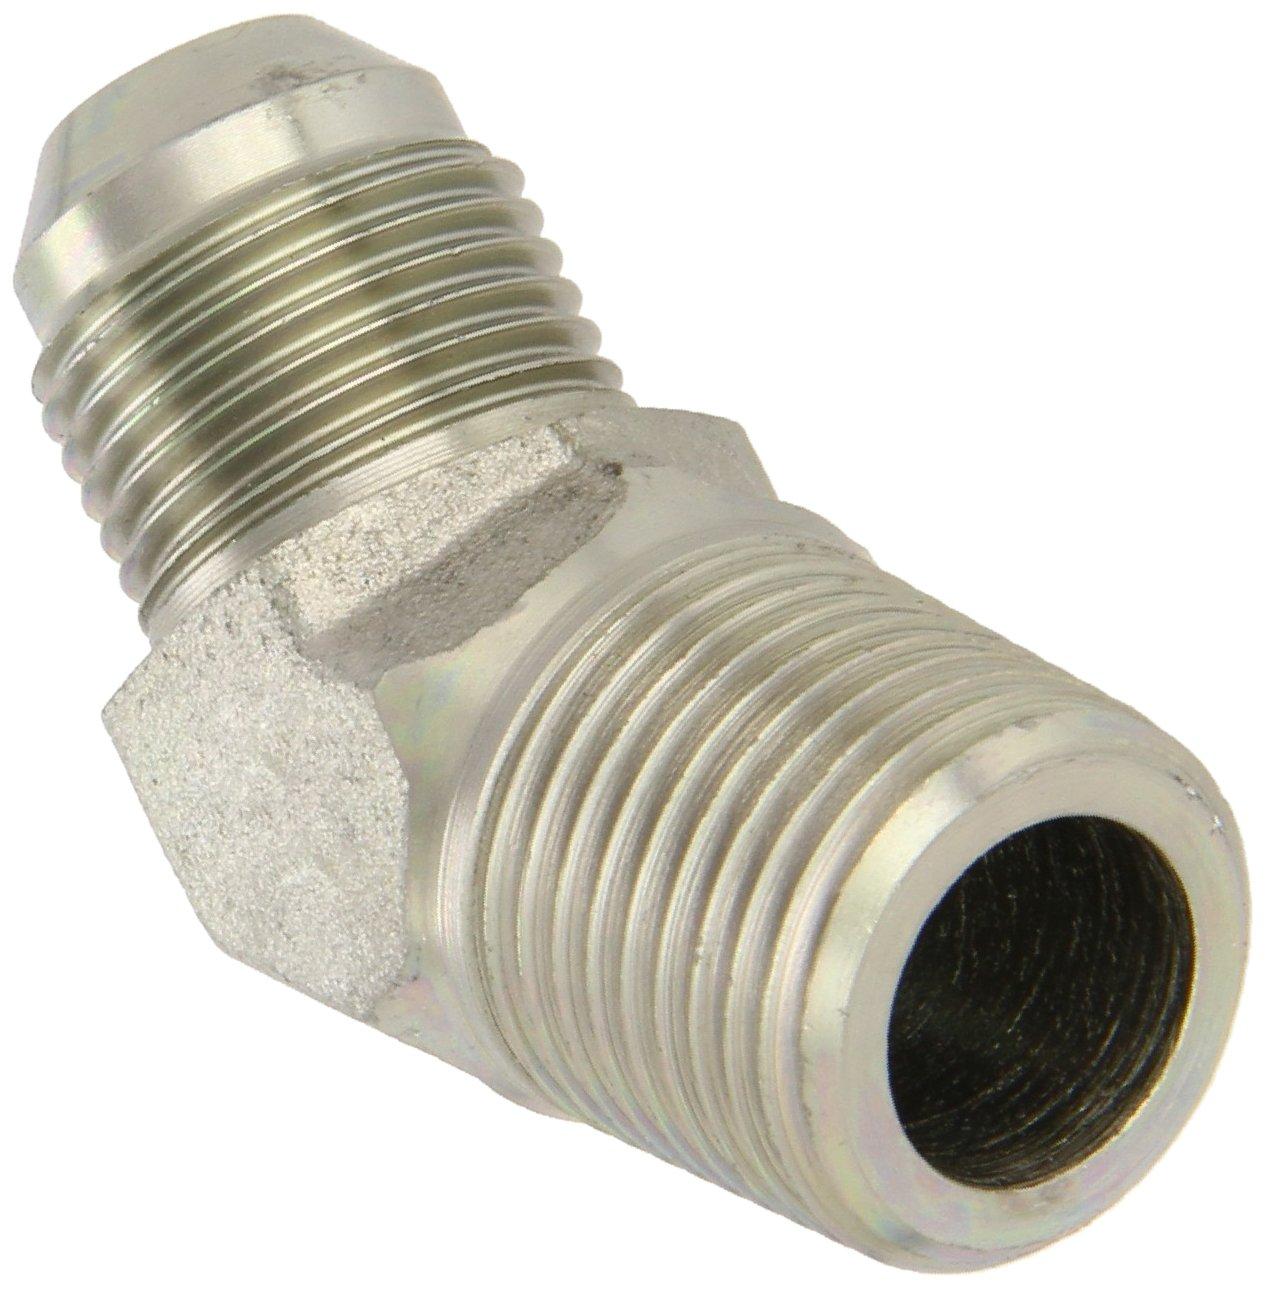 1//2 JIC 1//2 Tube OD End Size x 1//4 NPT m m JIC 37 Degree /& NPT End Types Eaton Aeroquip 2023-4-8S 45 Degree Male Elbow Carbon Steel 1//4 Male Pipe Size